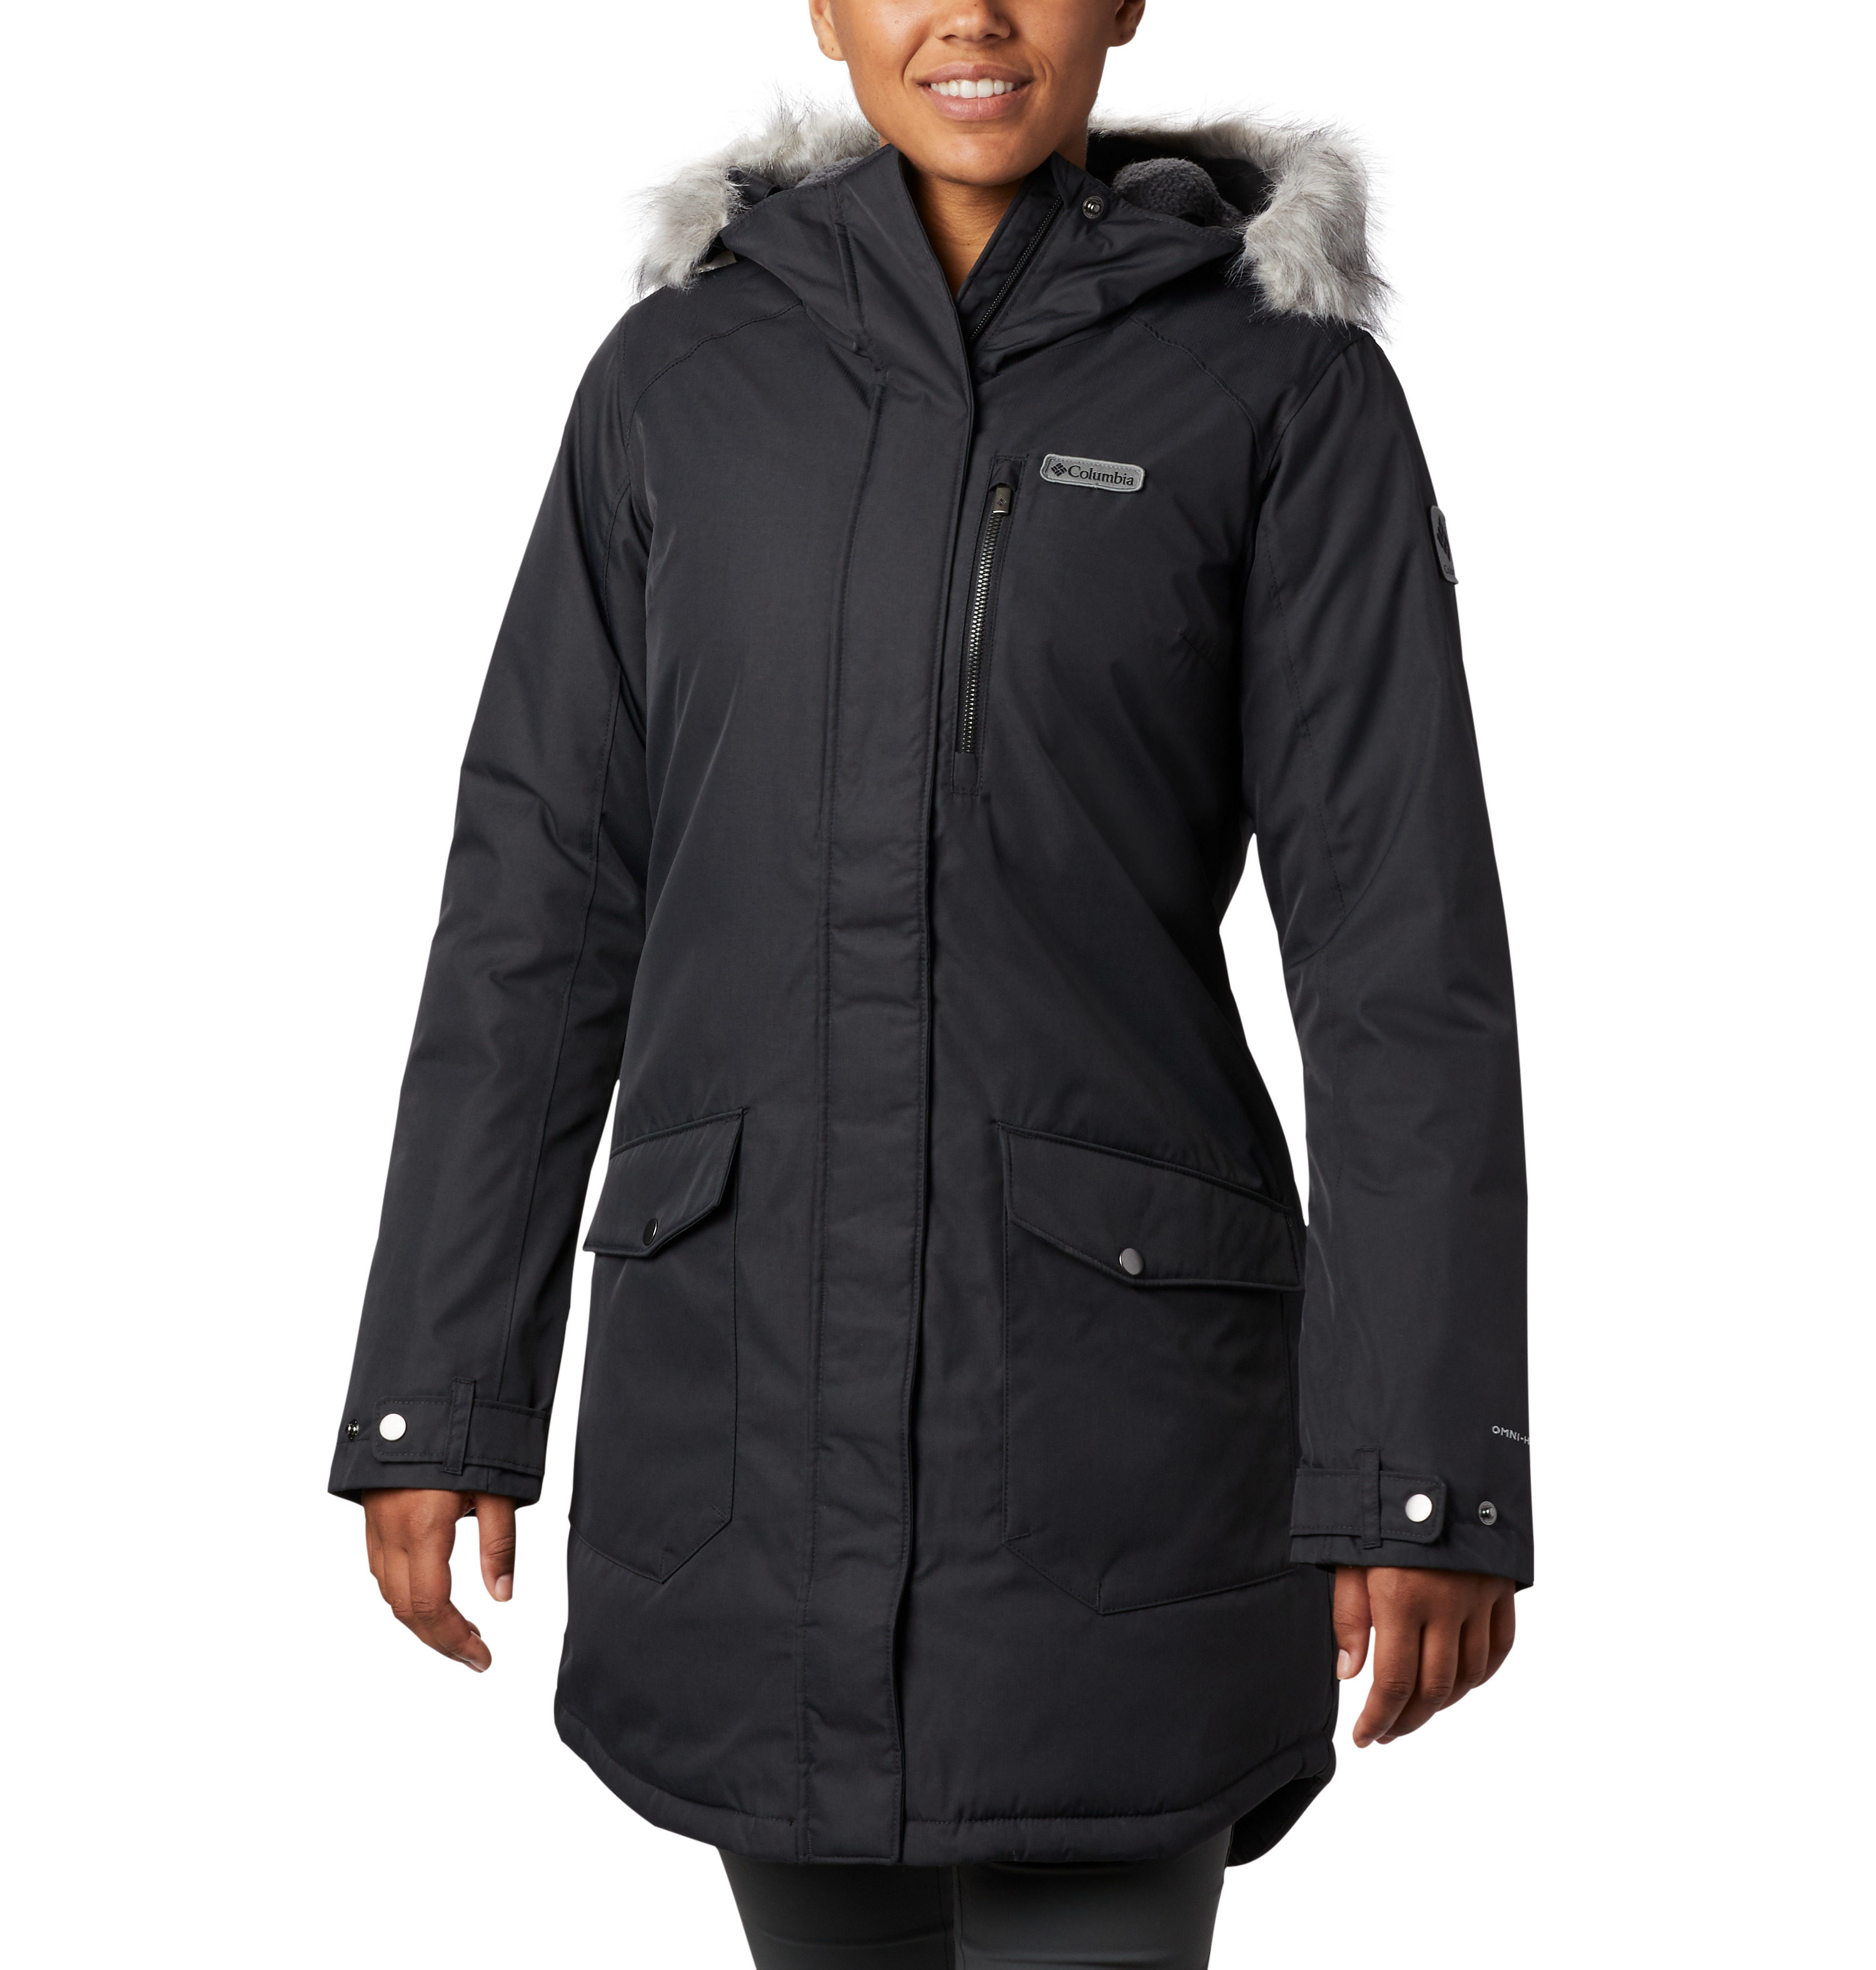 Women's Suttle Mountain Insulated Jacket, Black, swatch